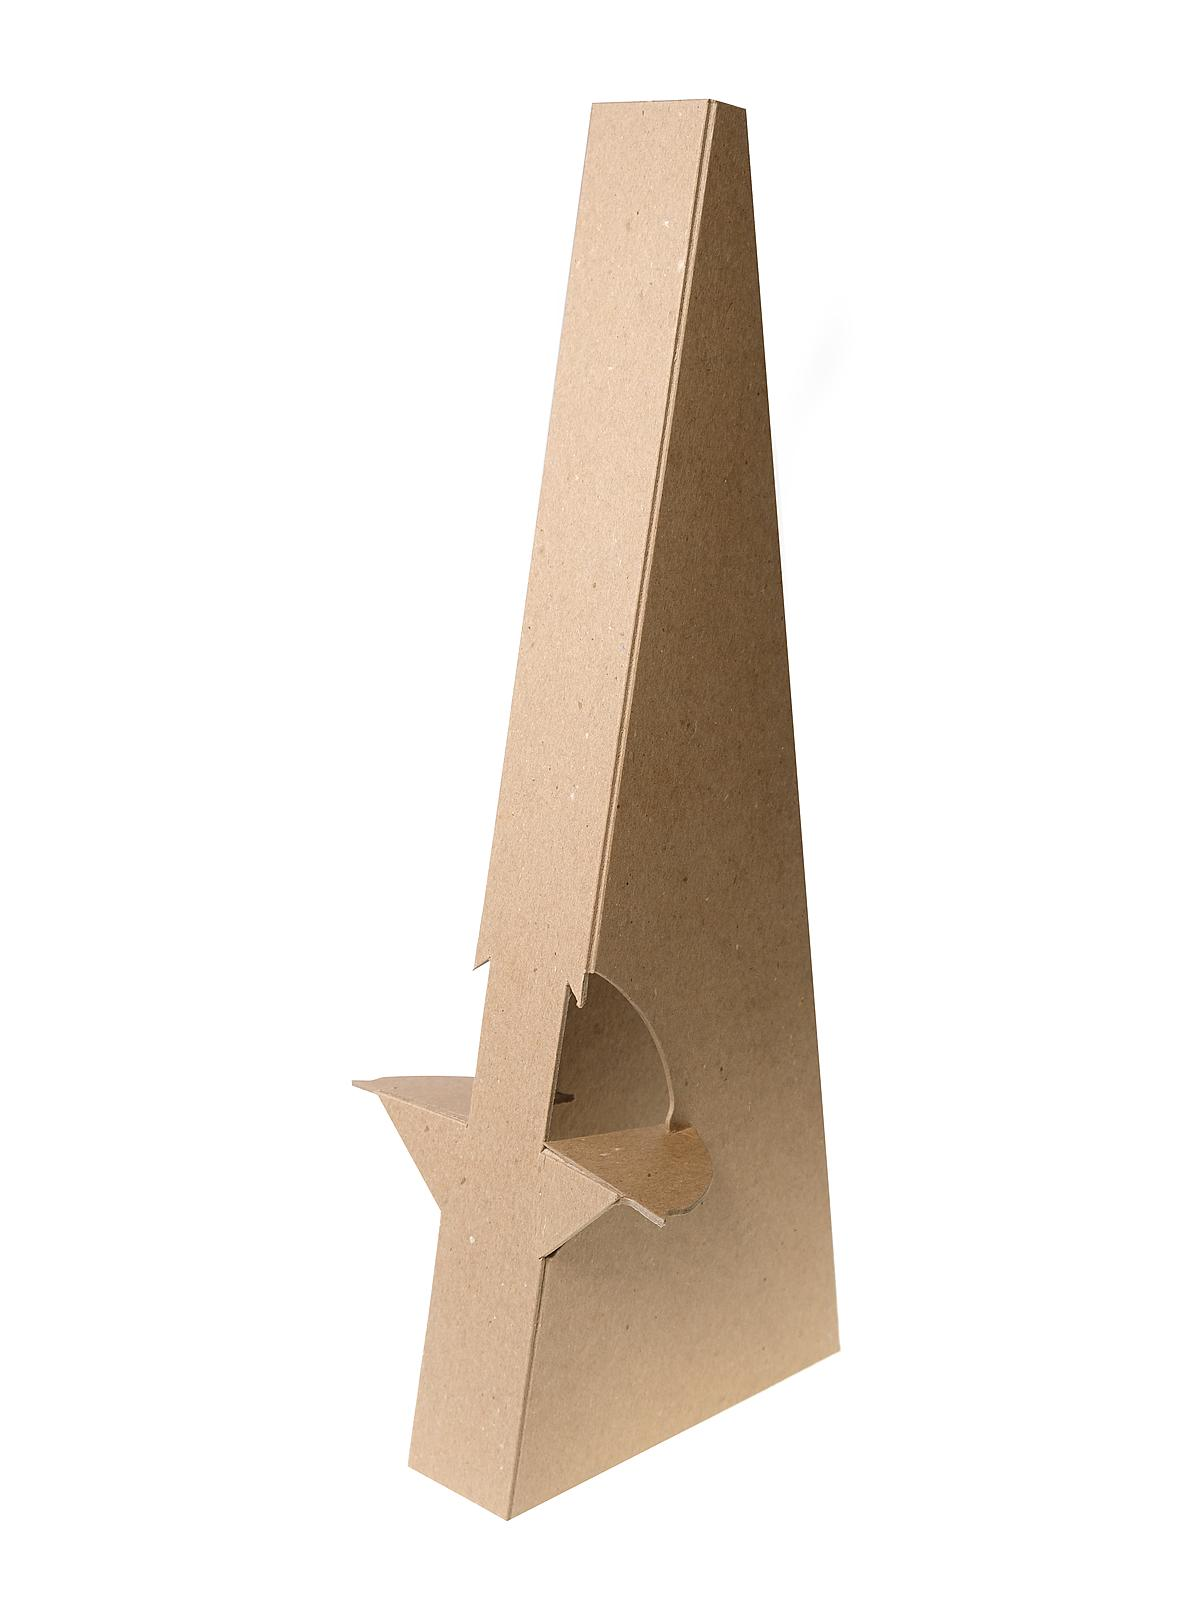 Cardboard Sign Easel